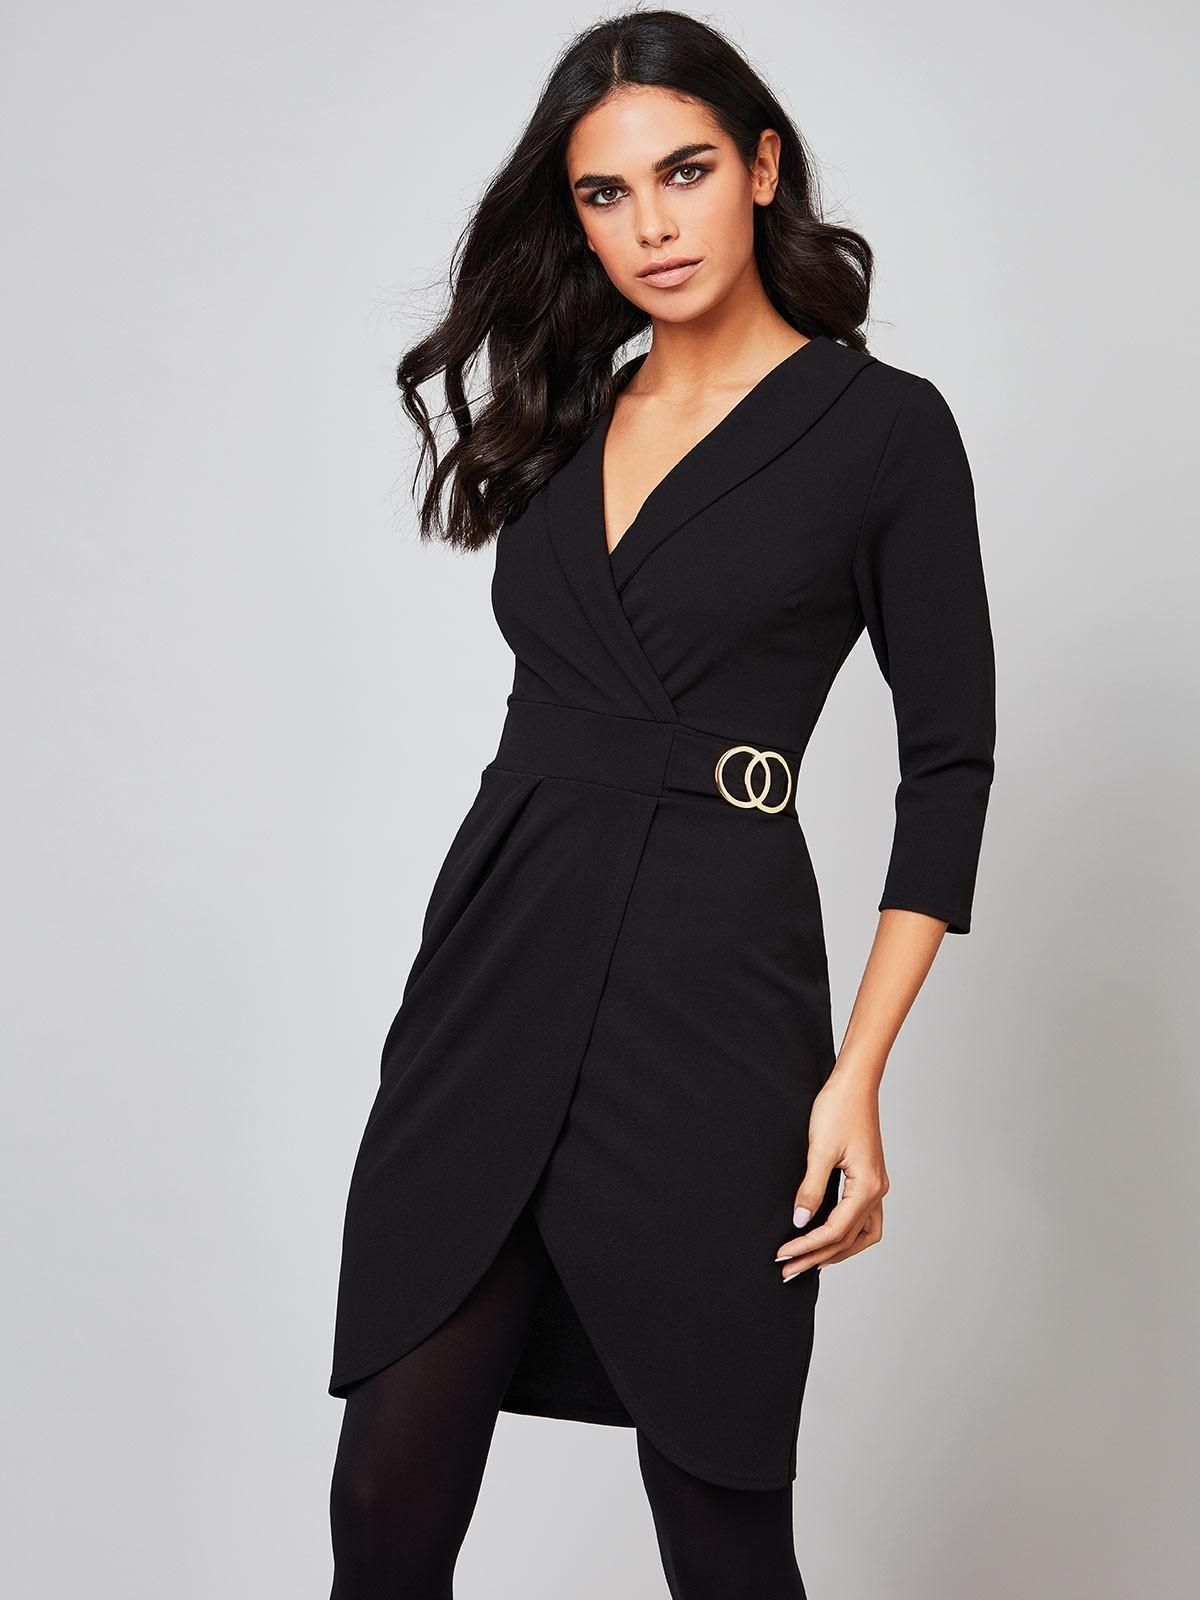 5008effe1487d Womens ENVY Black Blazer Dress | Peacocks | ♛ Smart Casual ♛ To ...